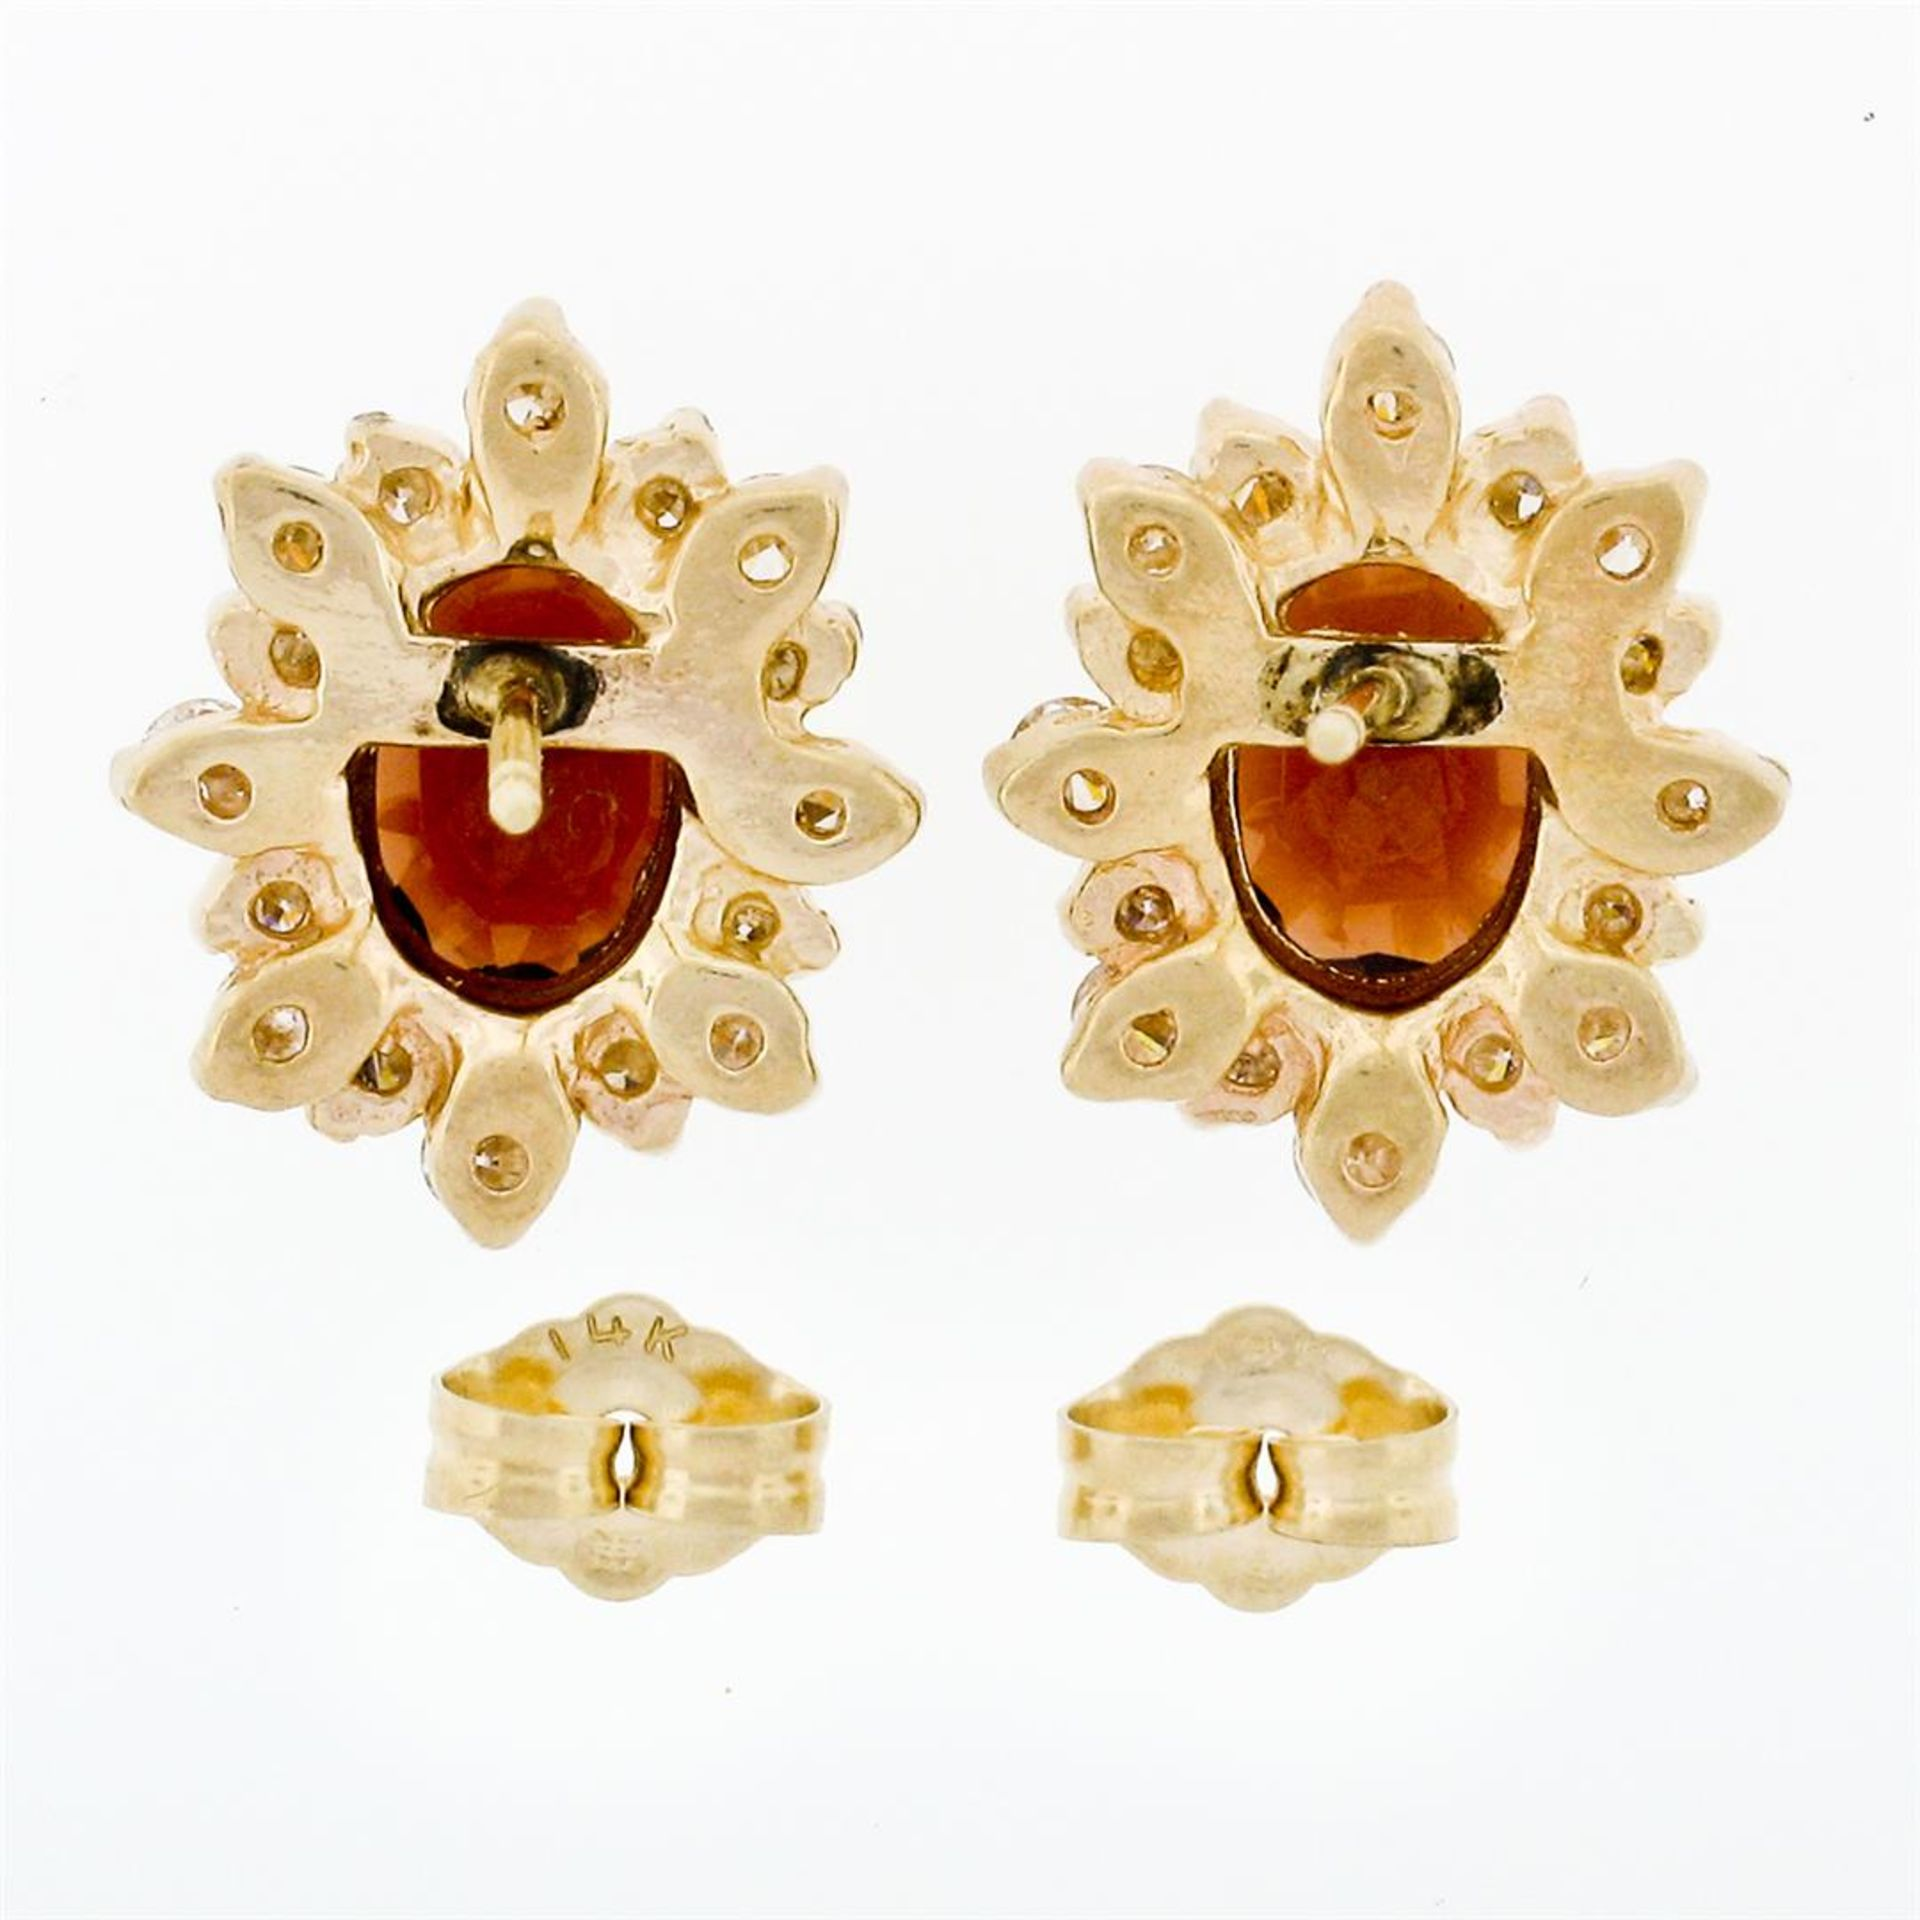 14k Yellow Gold 3.80ctw Oval Garnet & Layered Round Diamond Halo Stud Earrings - Image 5 of 5